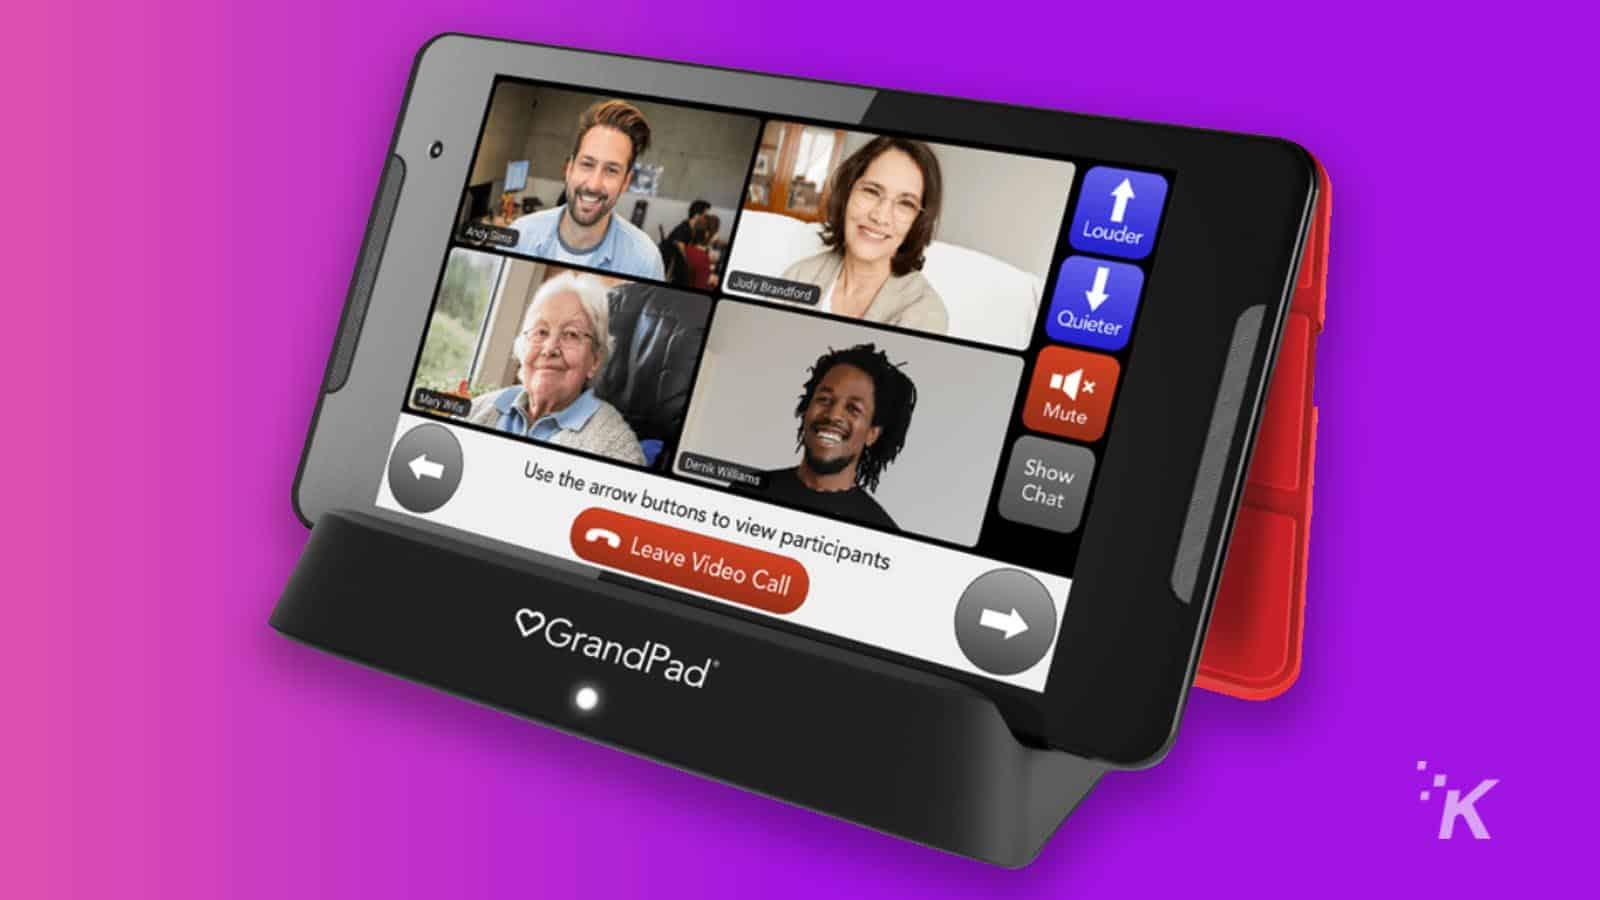 grandpad tablet